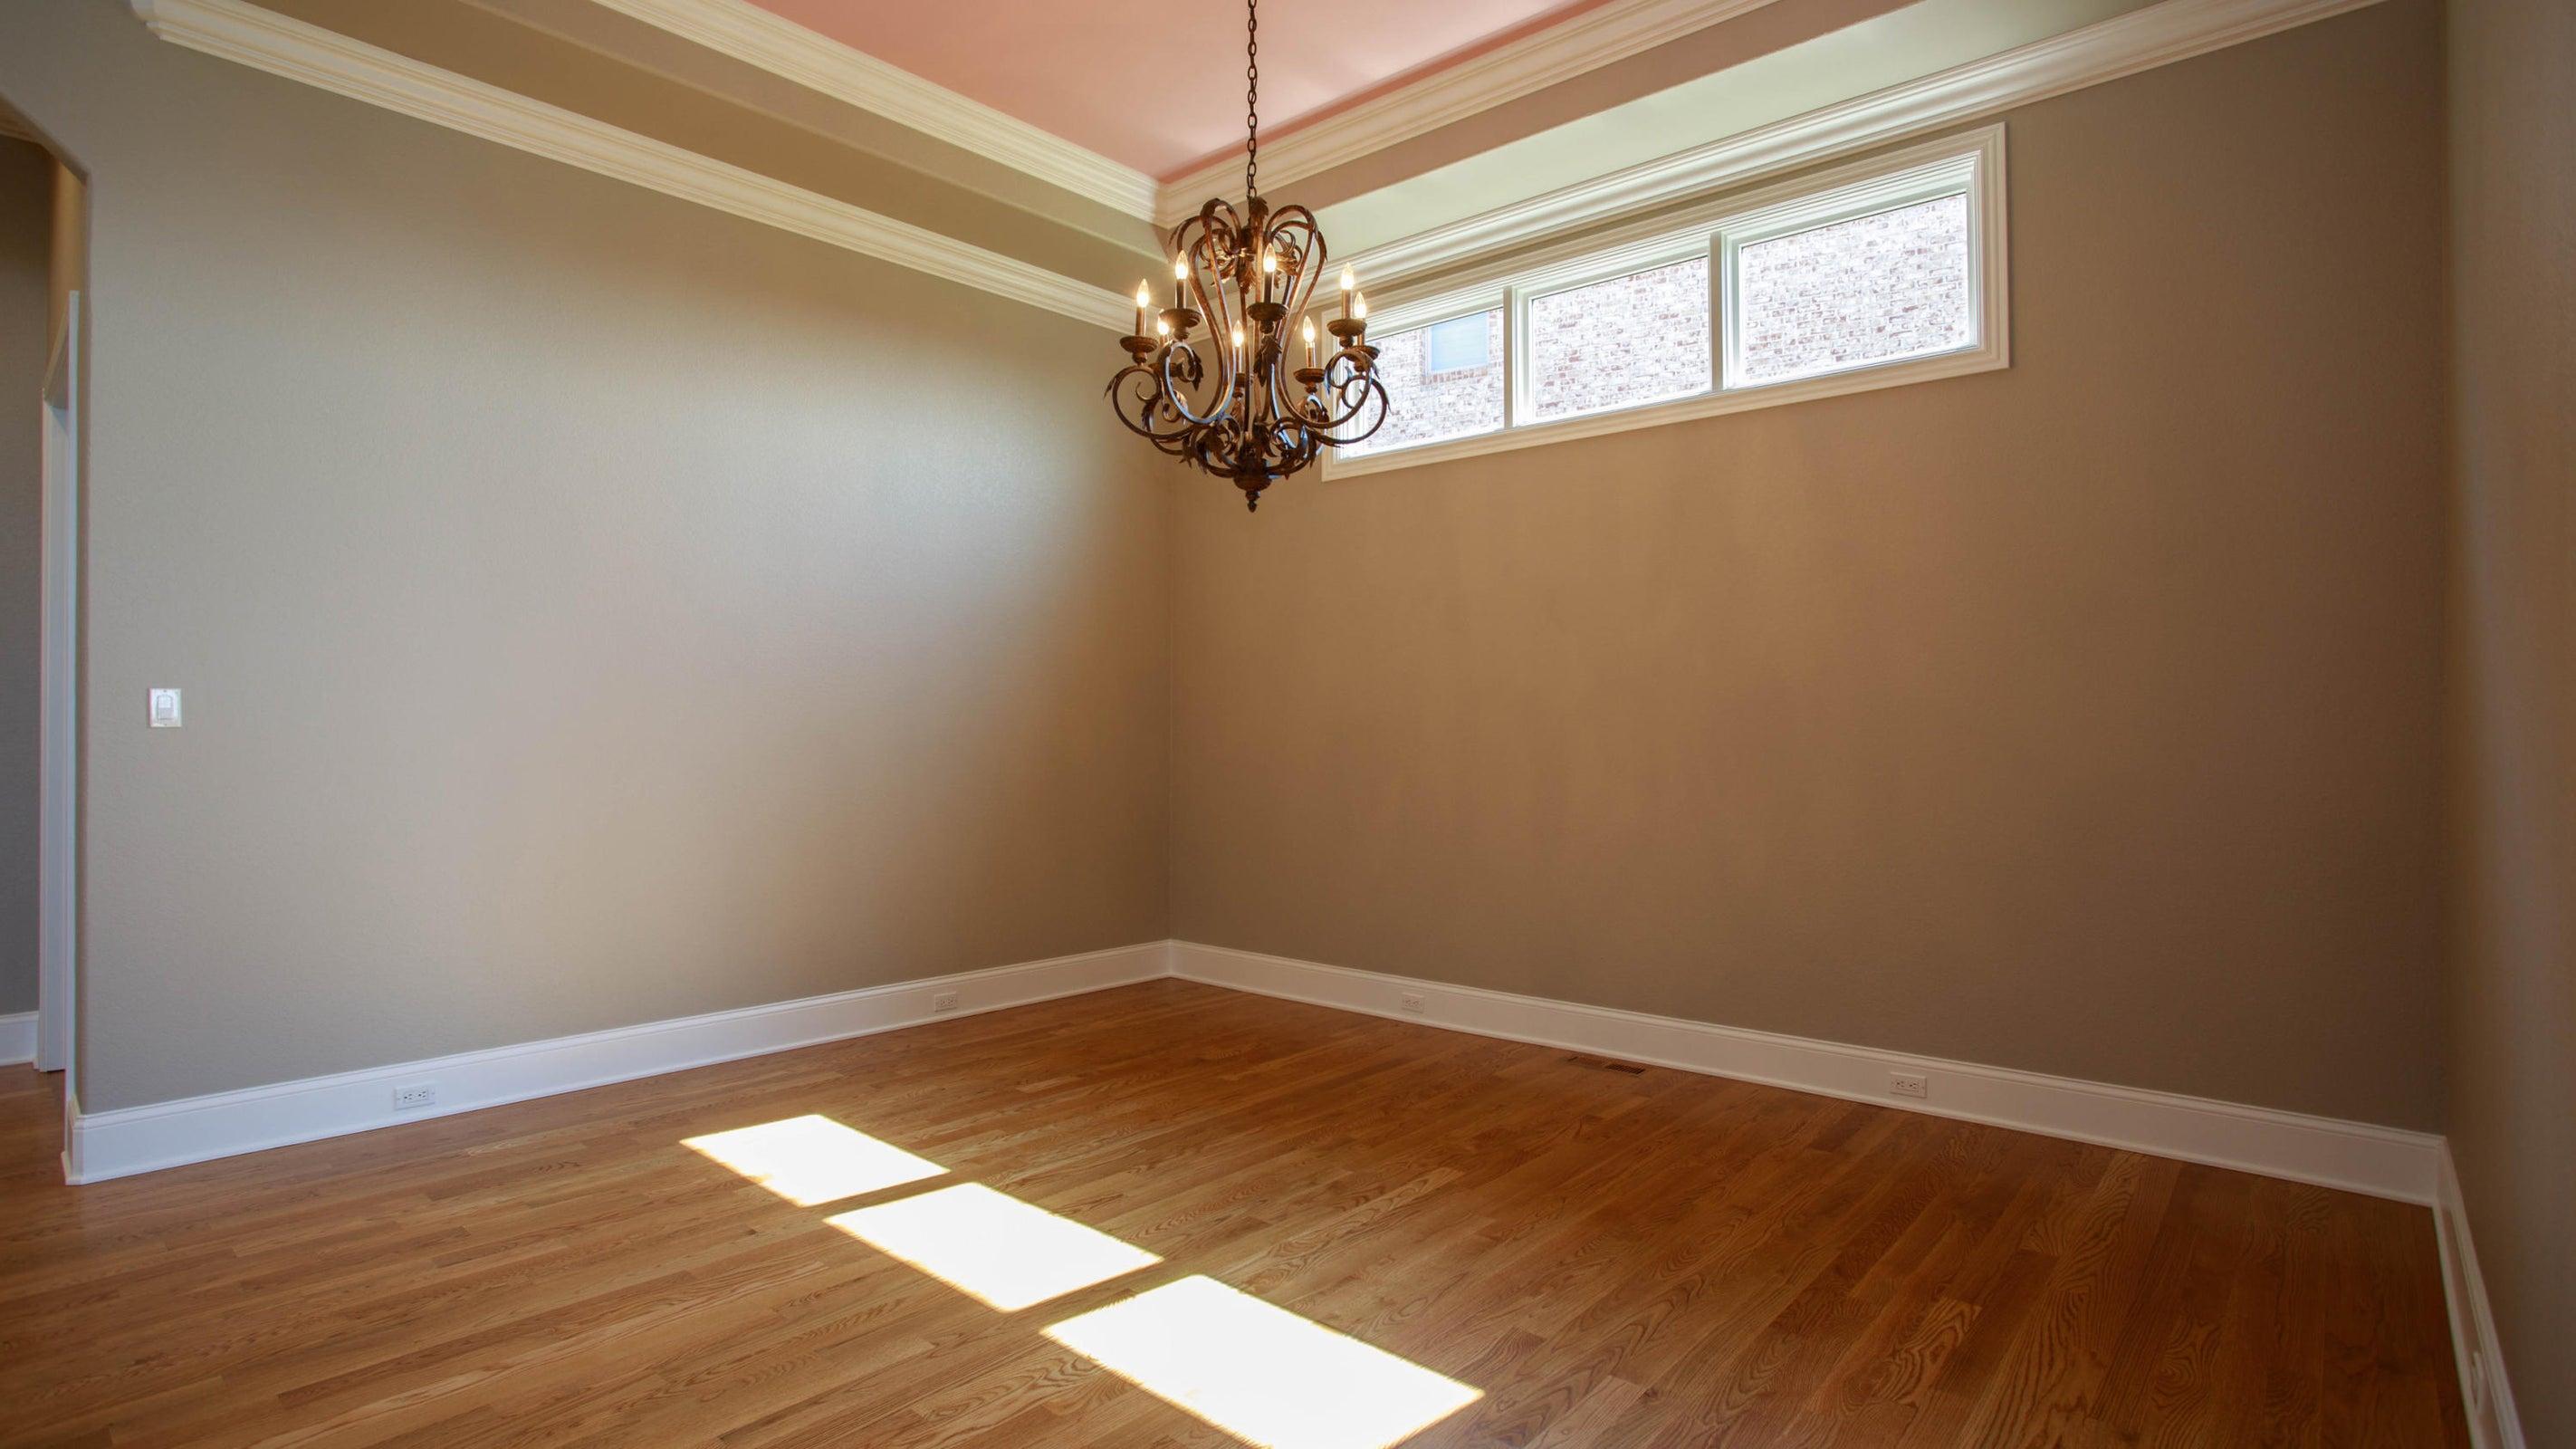 14' trey ceiling DR off kitchen/LR